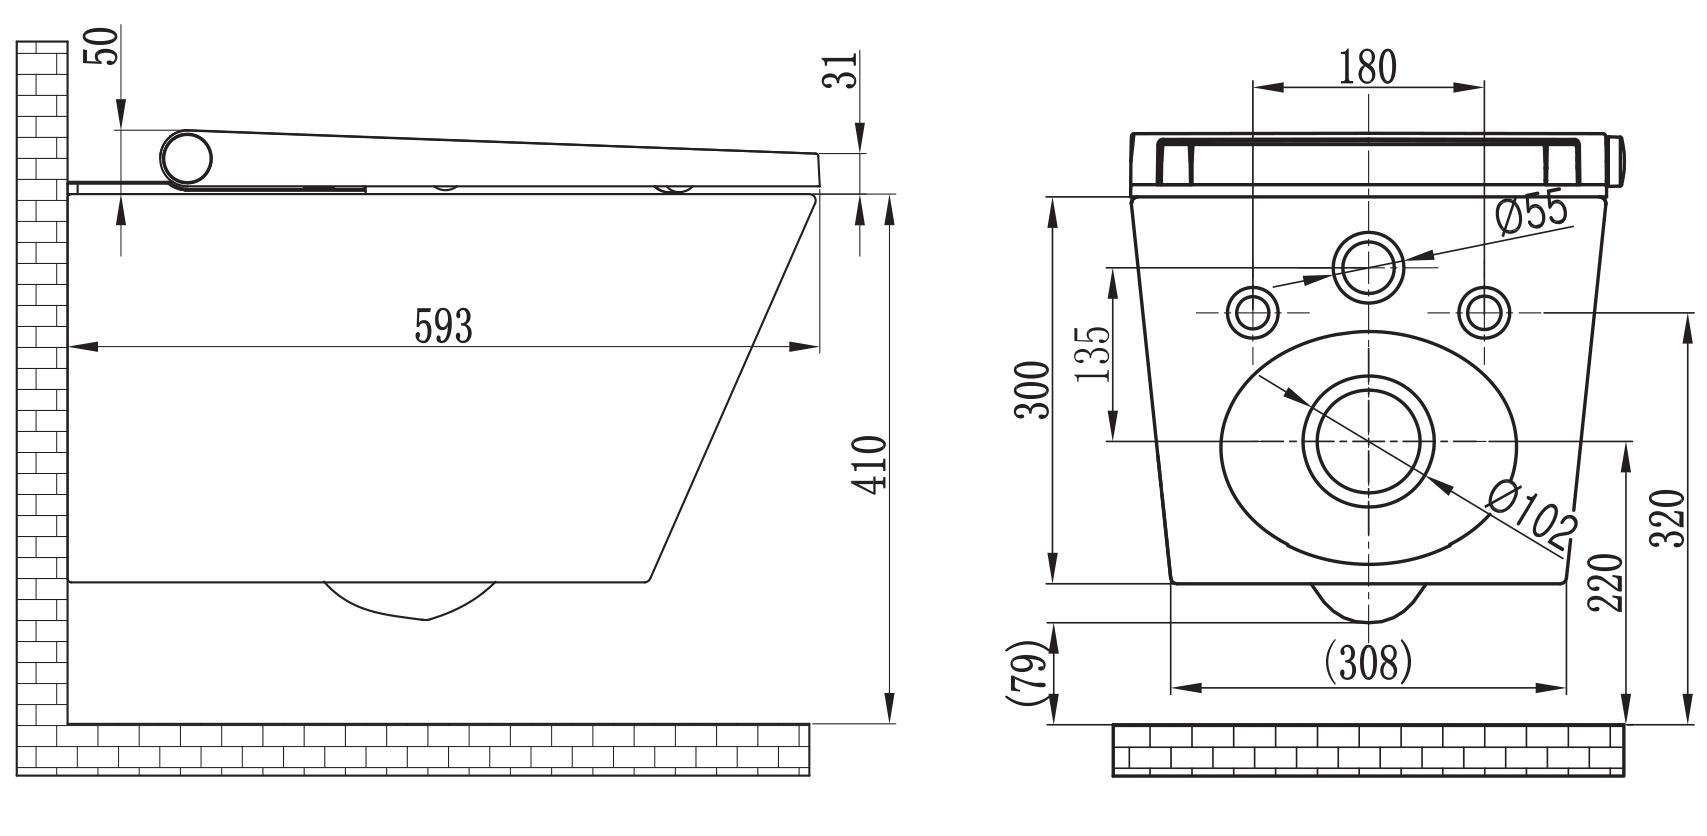 BERNSTEIN Dusch-WC Basic - Drawing 1